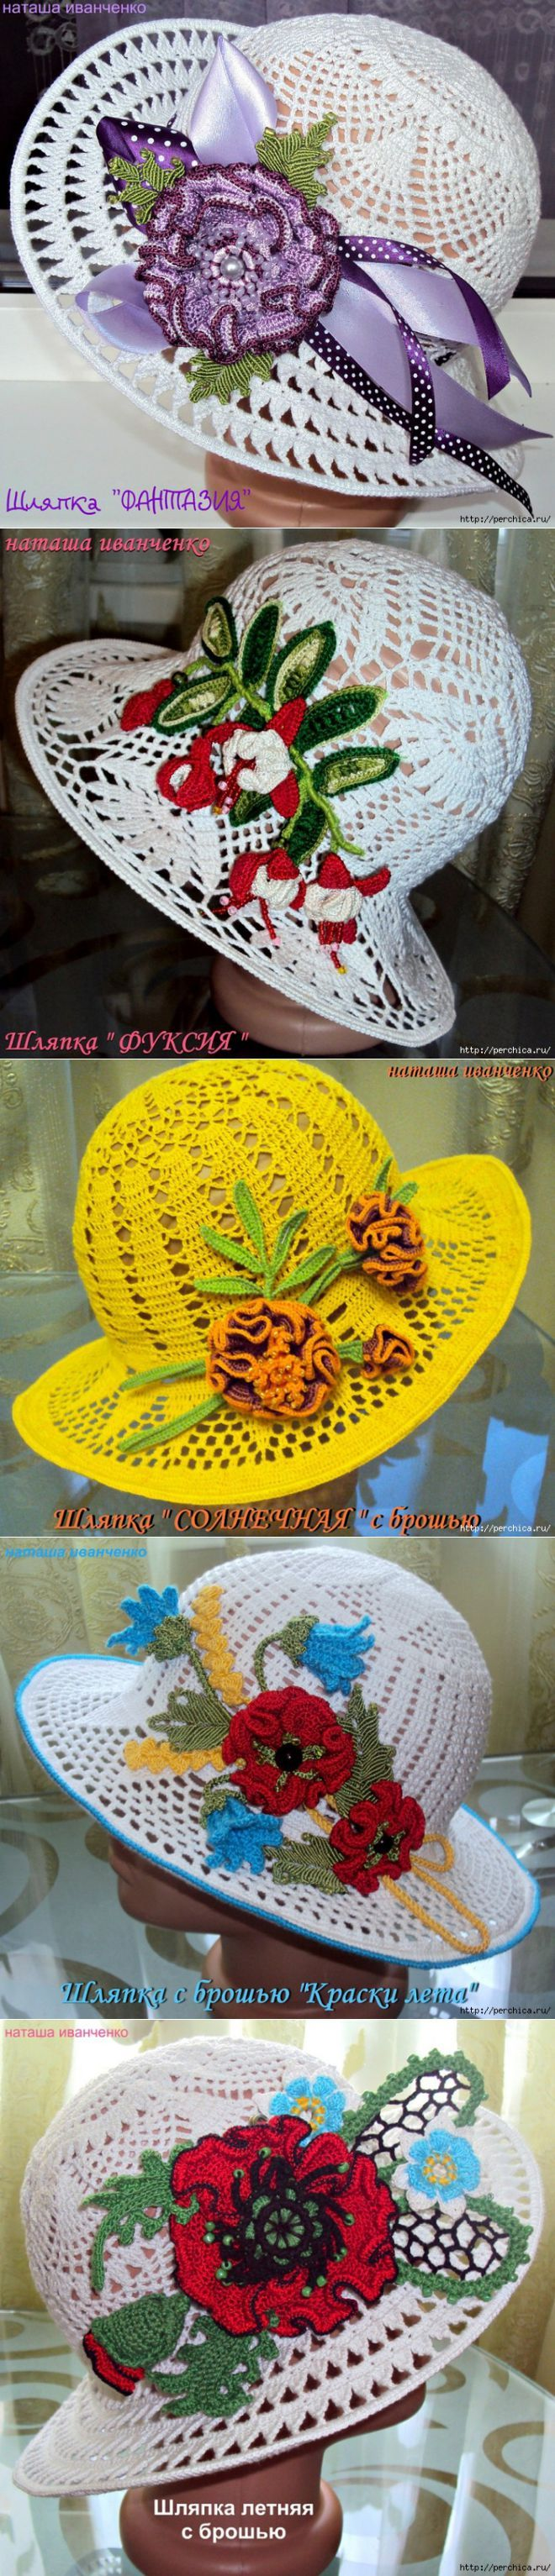 Crocheted Hats Knit Hats Crochet Hat Patterns Crochet Clothes Summer Hats Diy Hat Por Favor Argentina Cactus